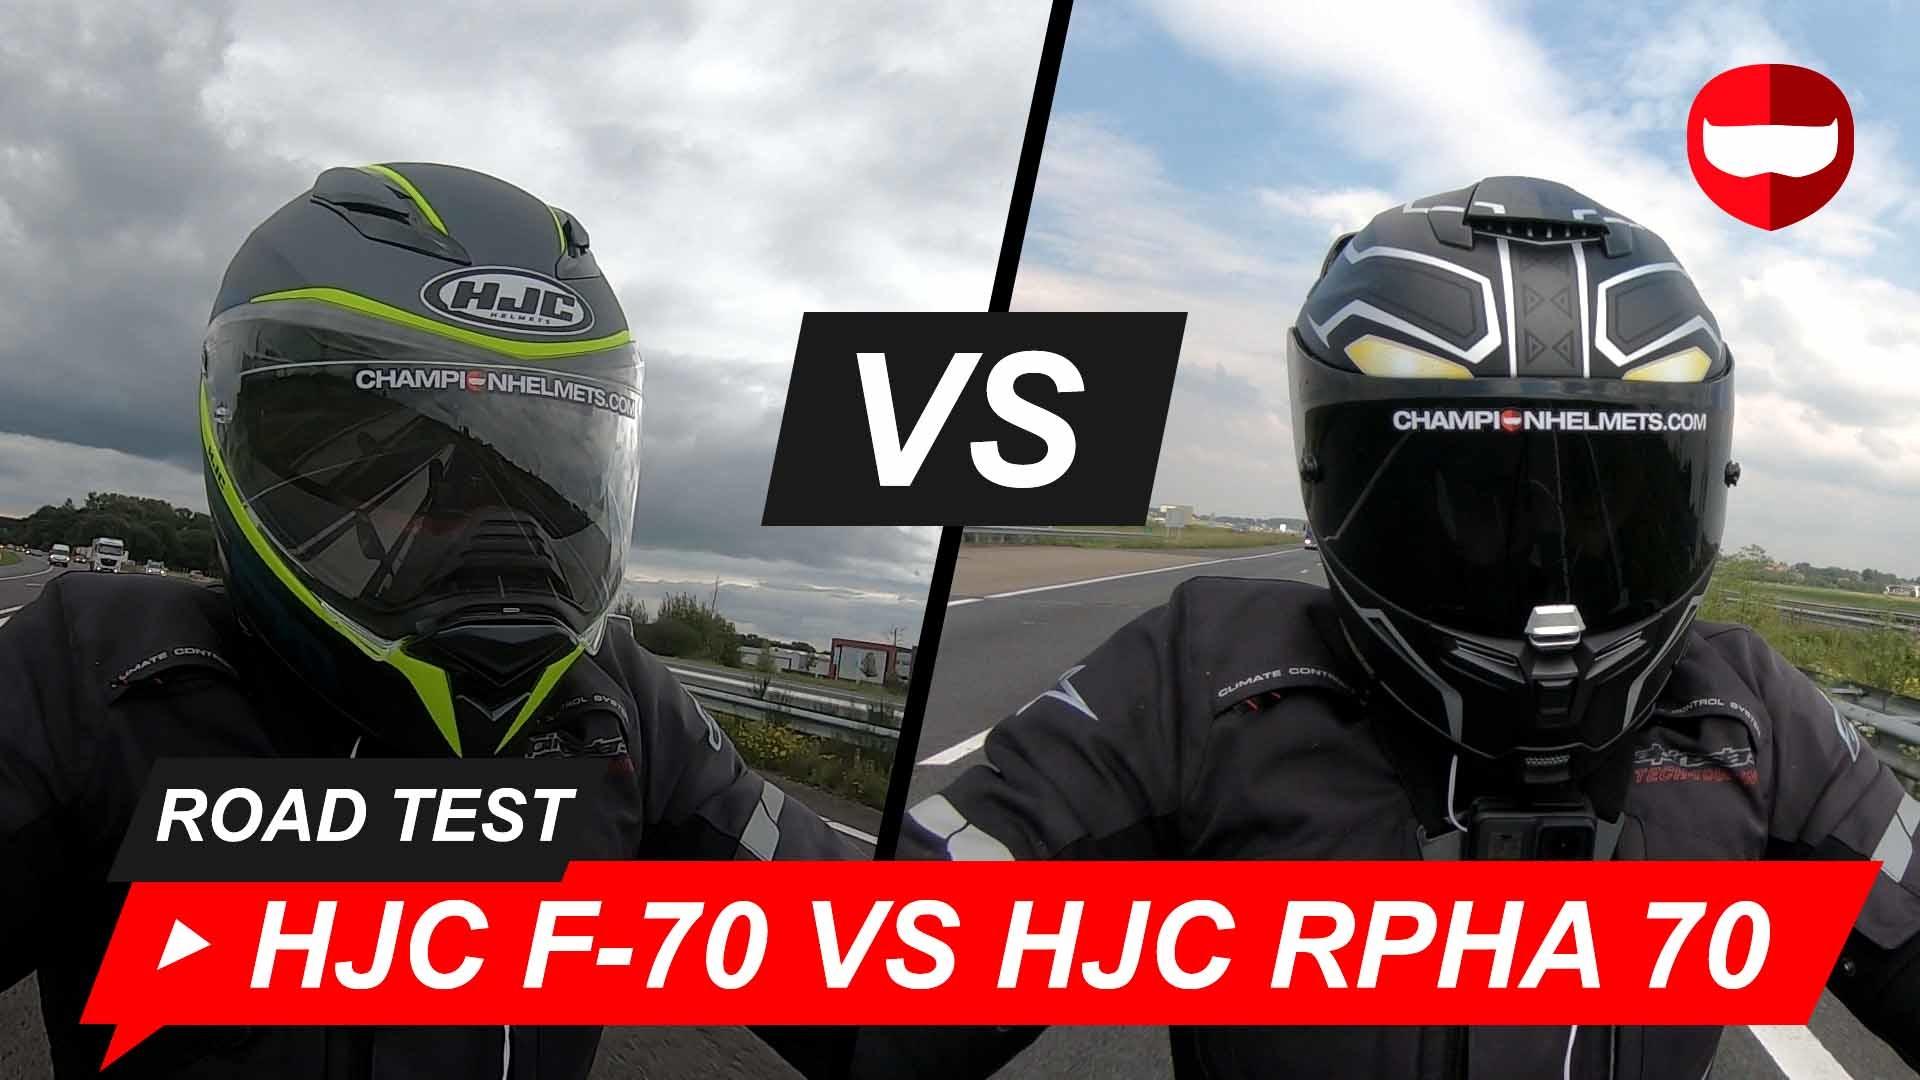 HJC F70 vs HJC RPHA 70 Road Test + Video